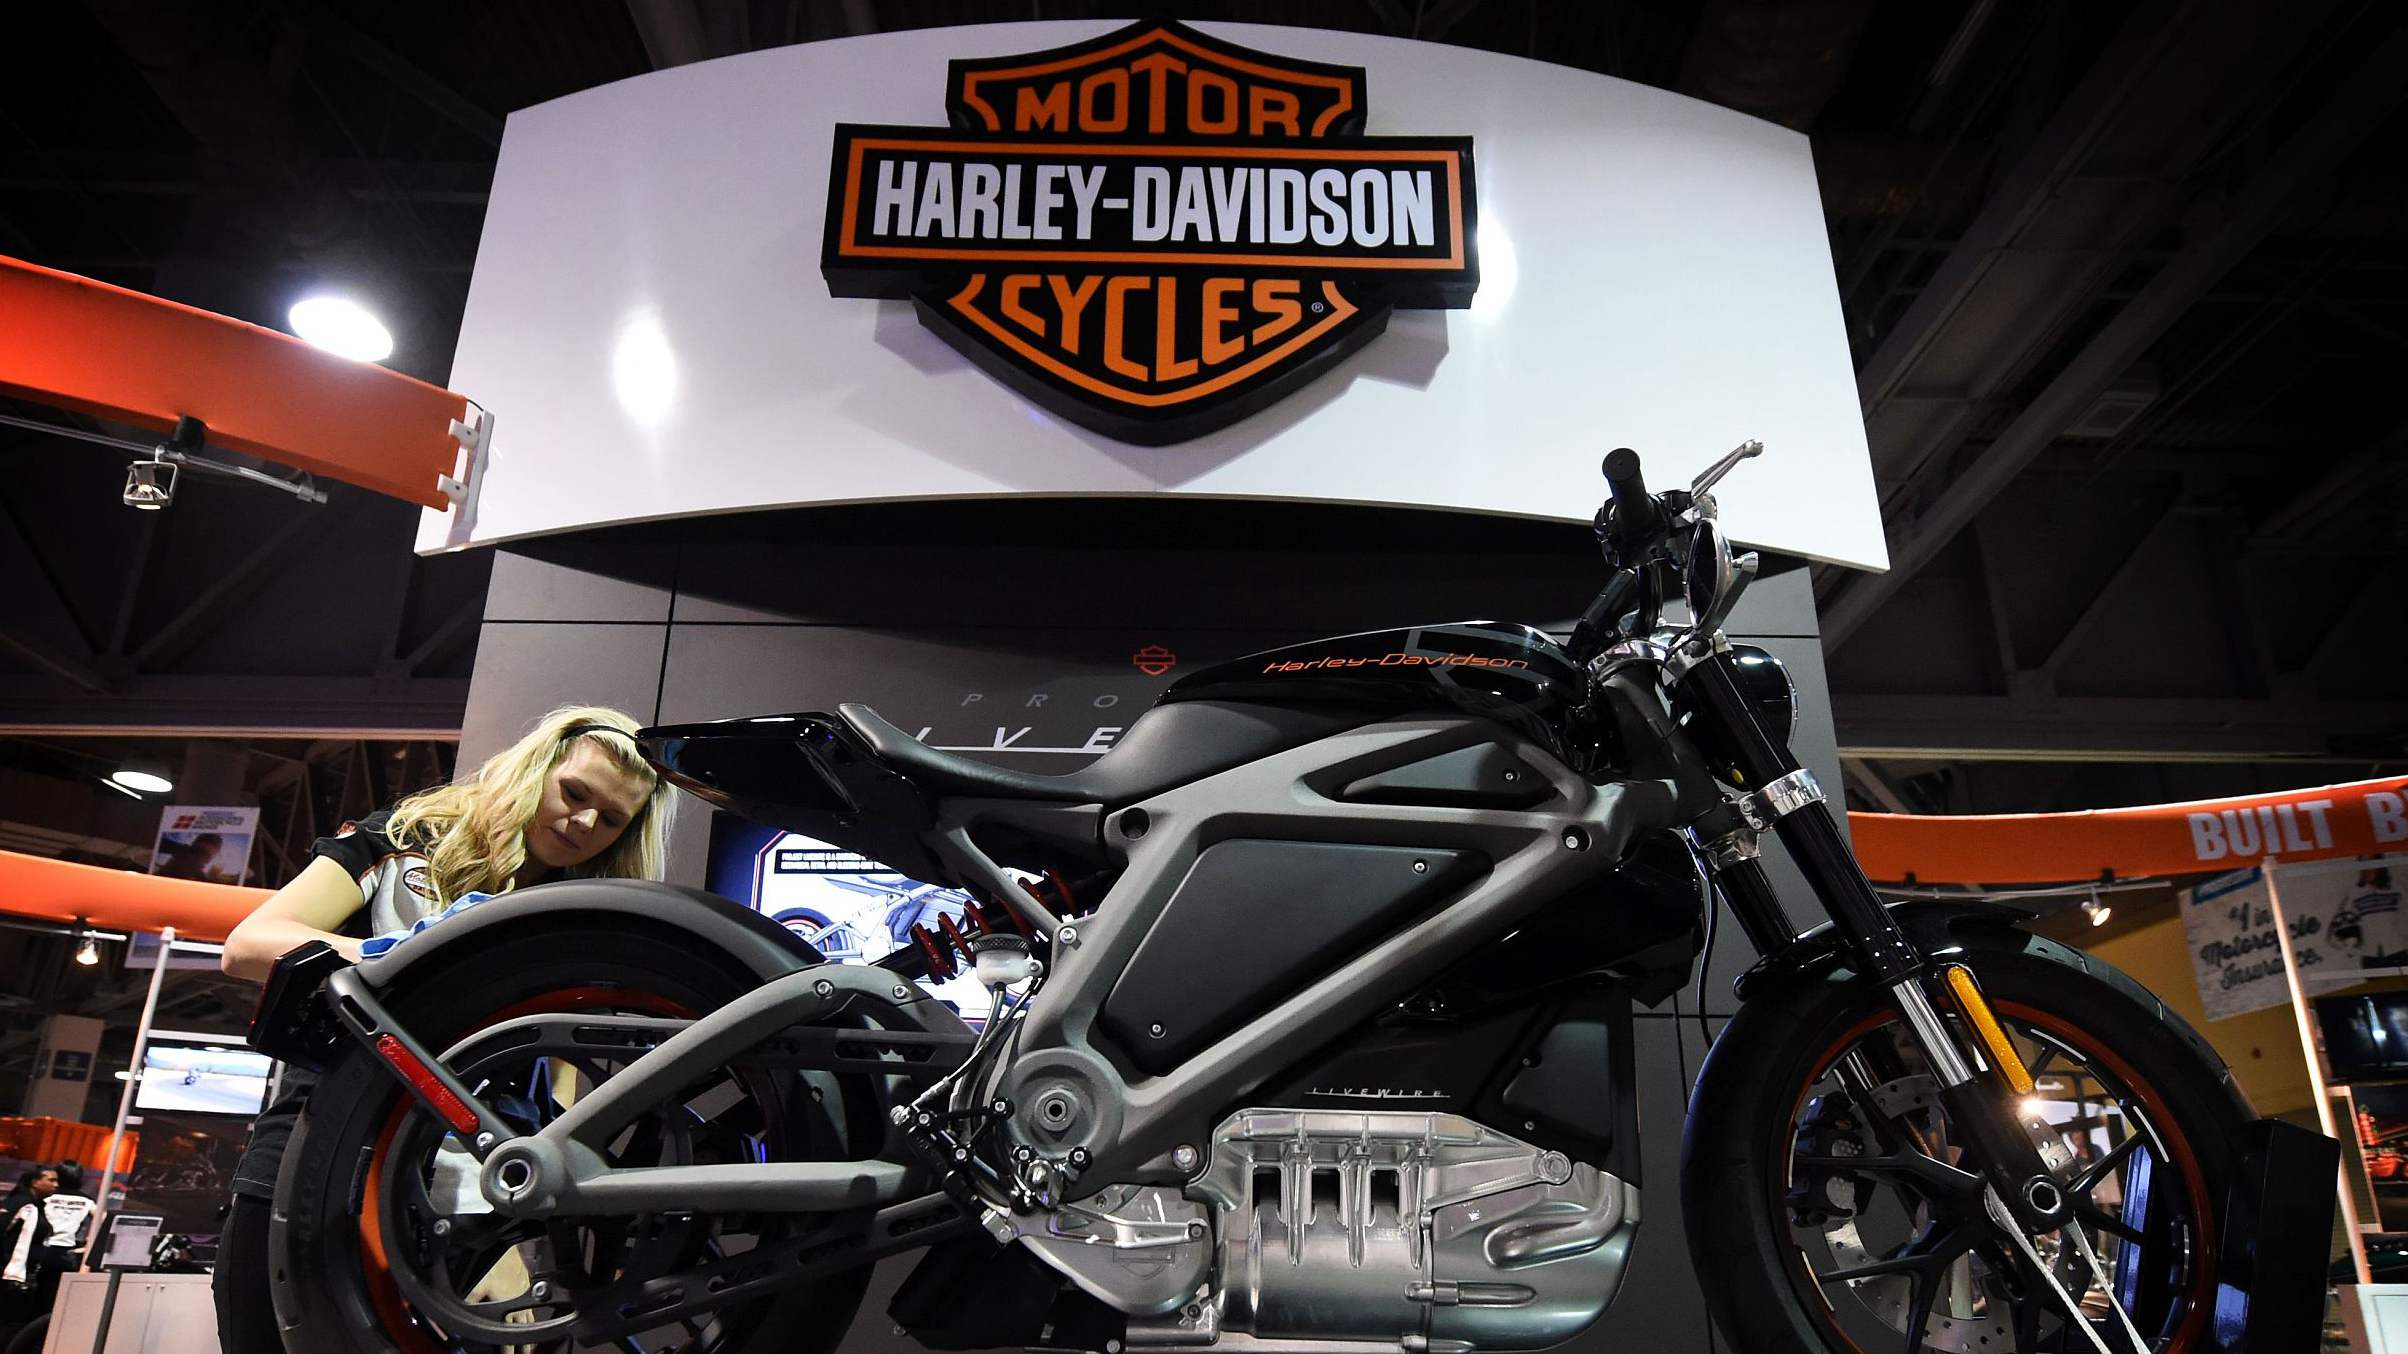 Harley-Davidson reports profit fall, warning damage from trade war